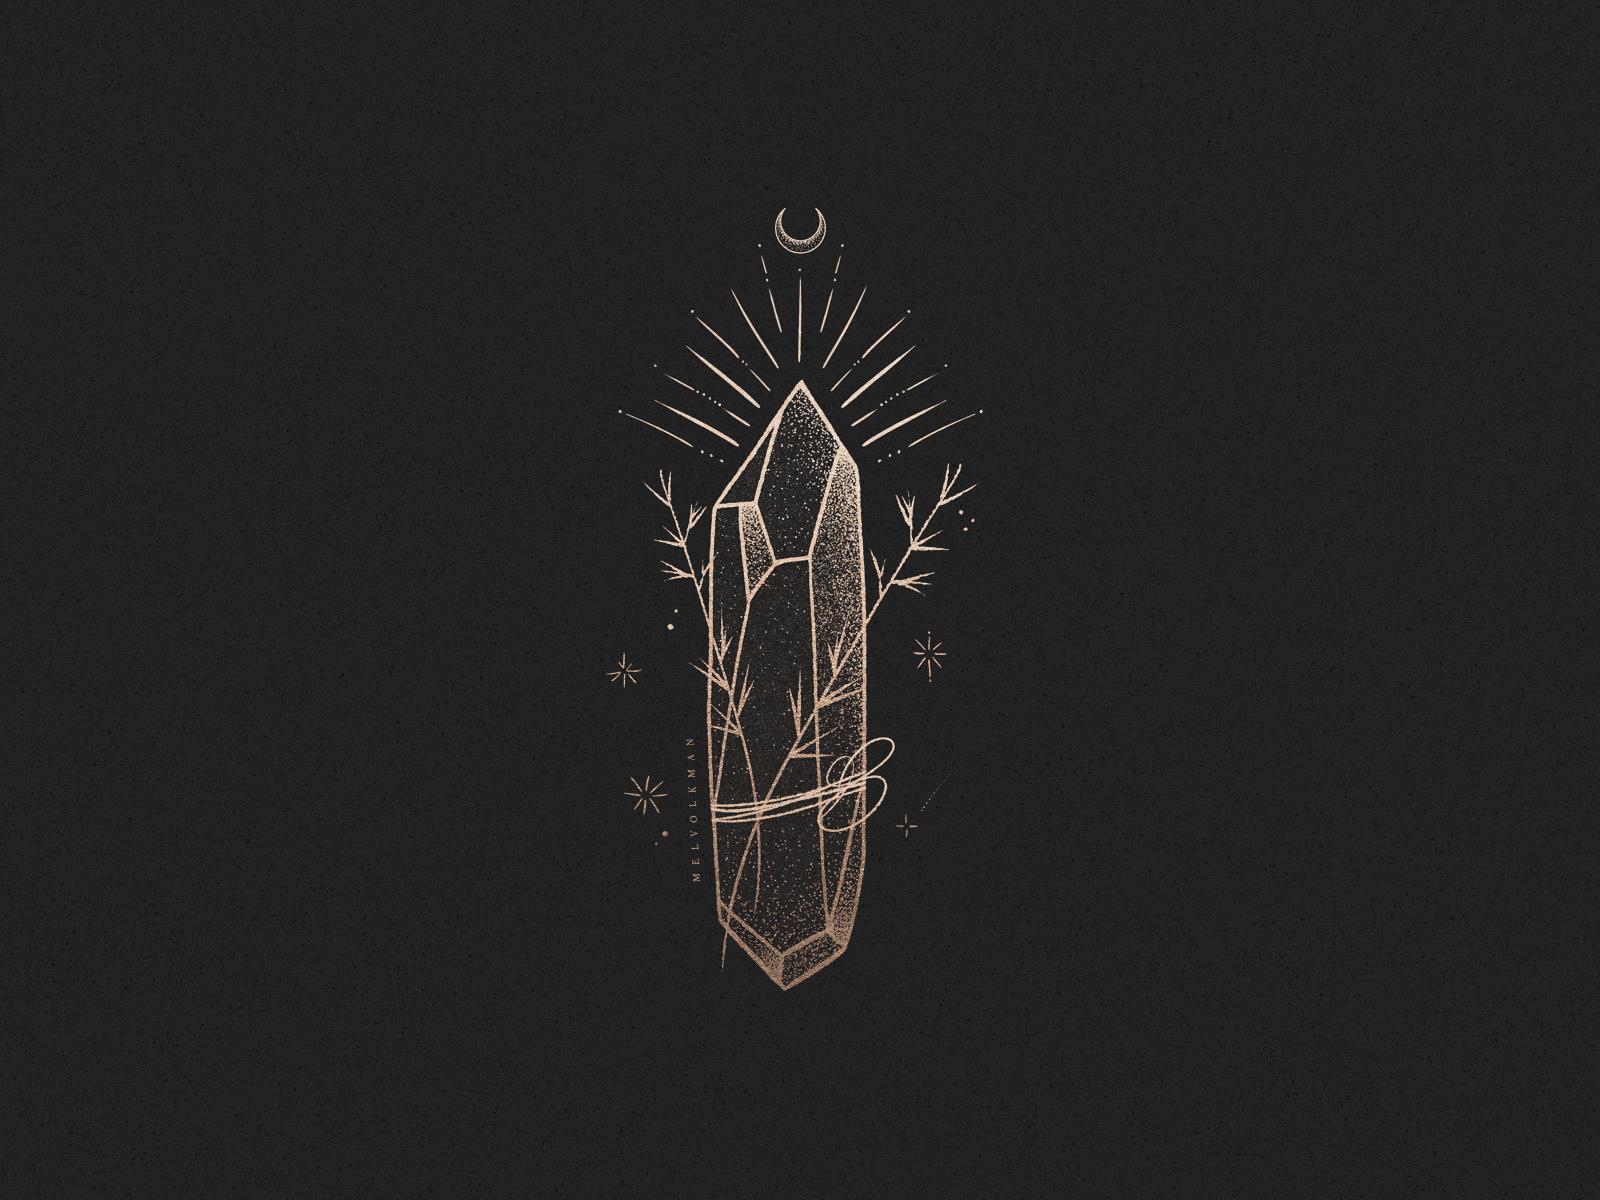 Magical Crystal Illustration By Mel Volkman Crystal Illustration Witchy Wallpaper Mystic Wallpaper